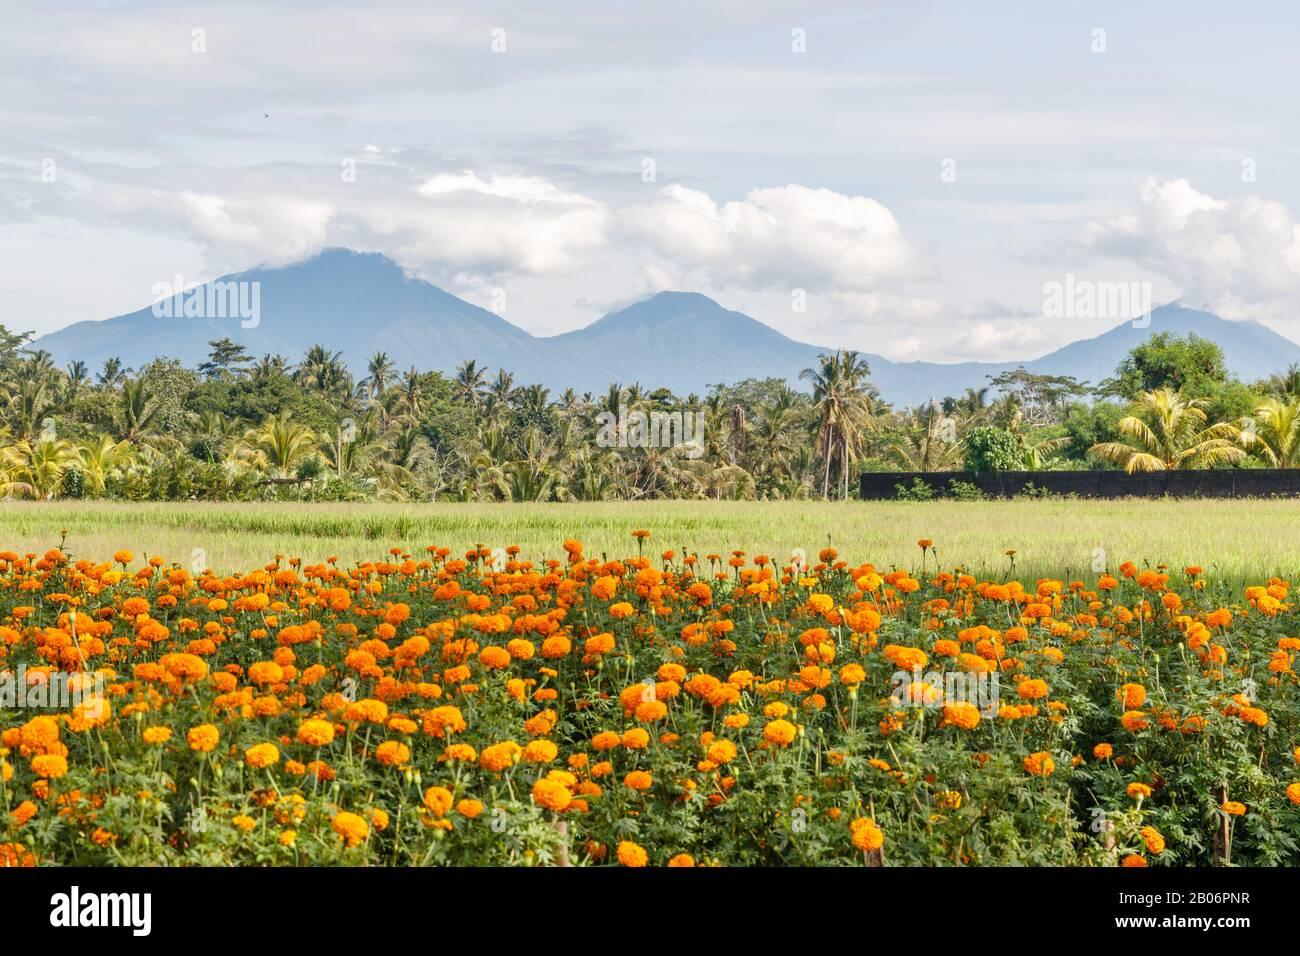 Rice field, mountains on the background. Rural landscape. Bedugul, Tabanan, Bali Island, Indonesia. Stock Photo